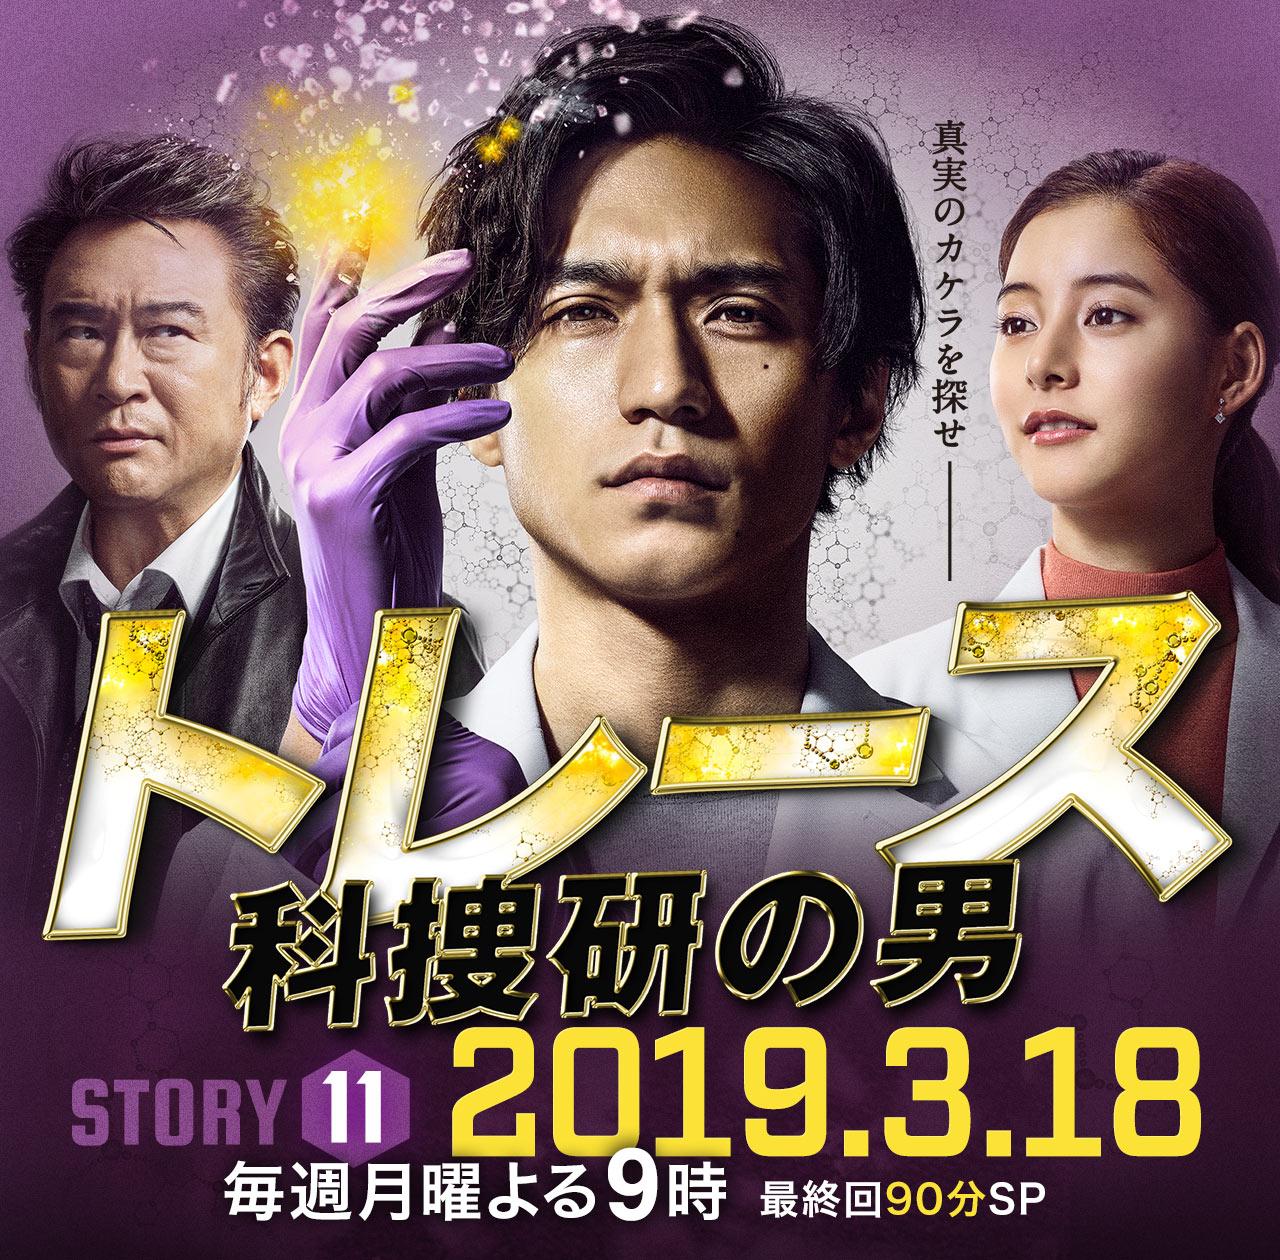 مسلسل Trace: Kasouken No Otoko مترجم